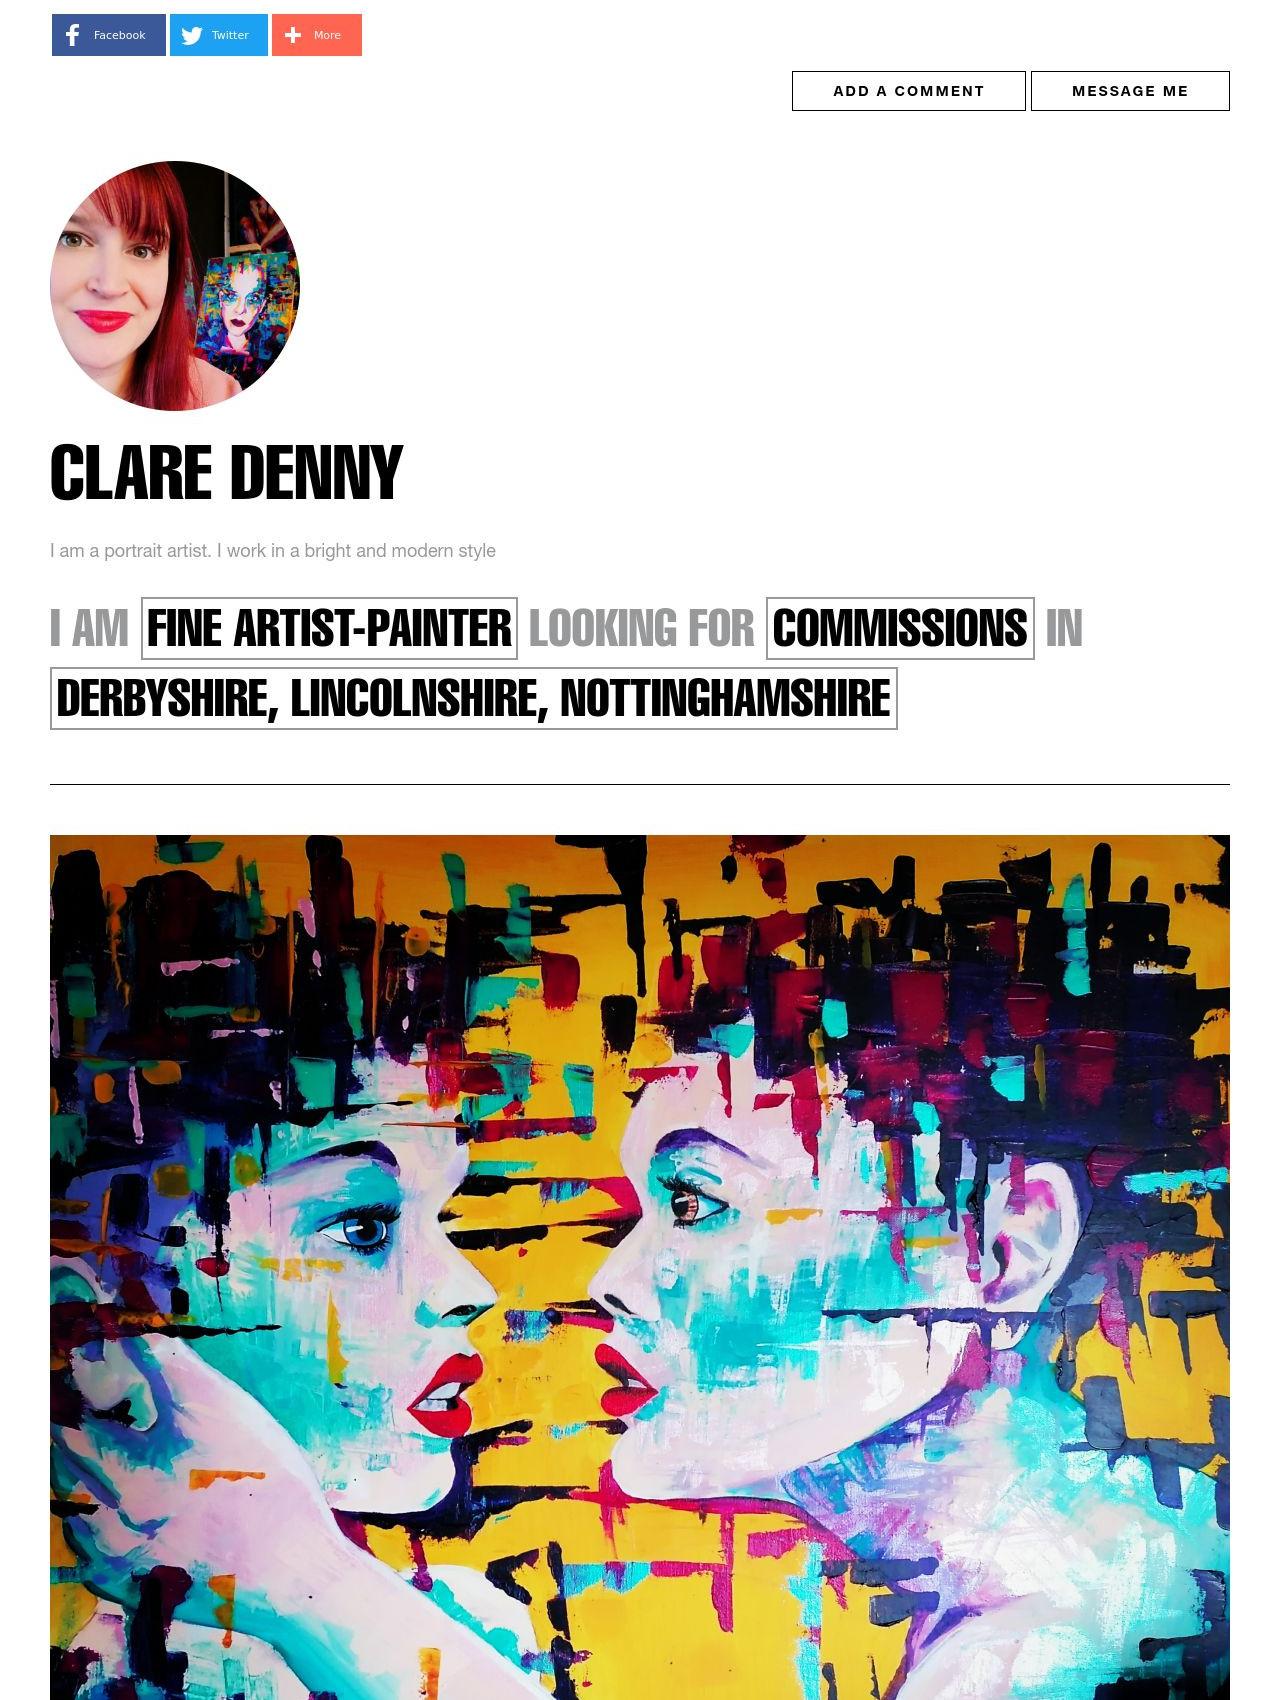 Clare Denny